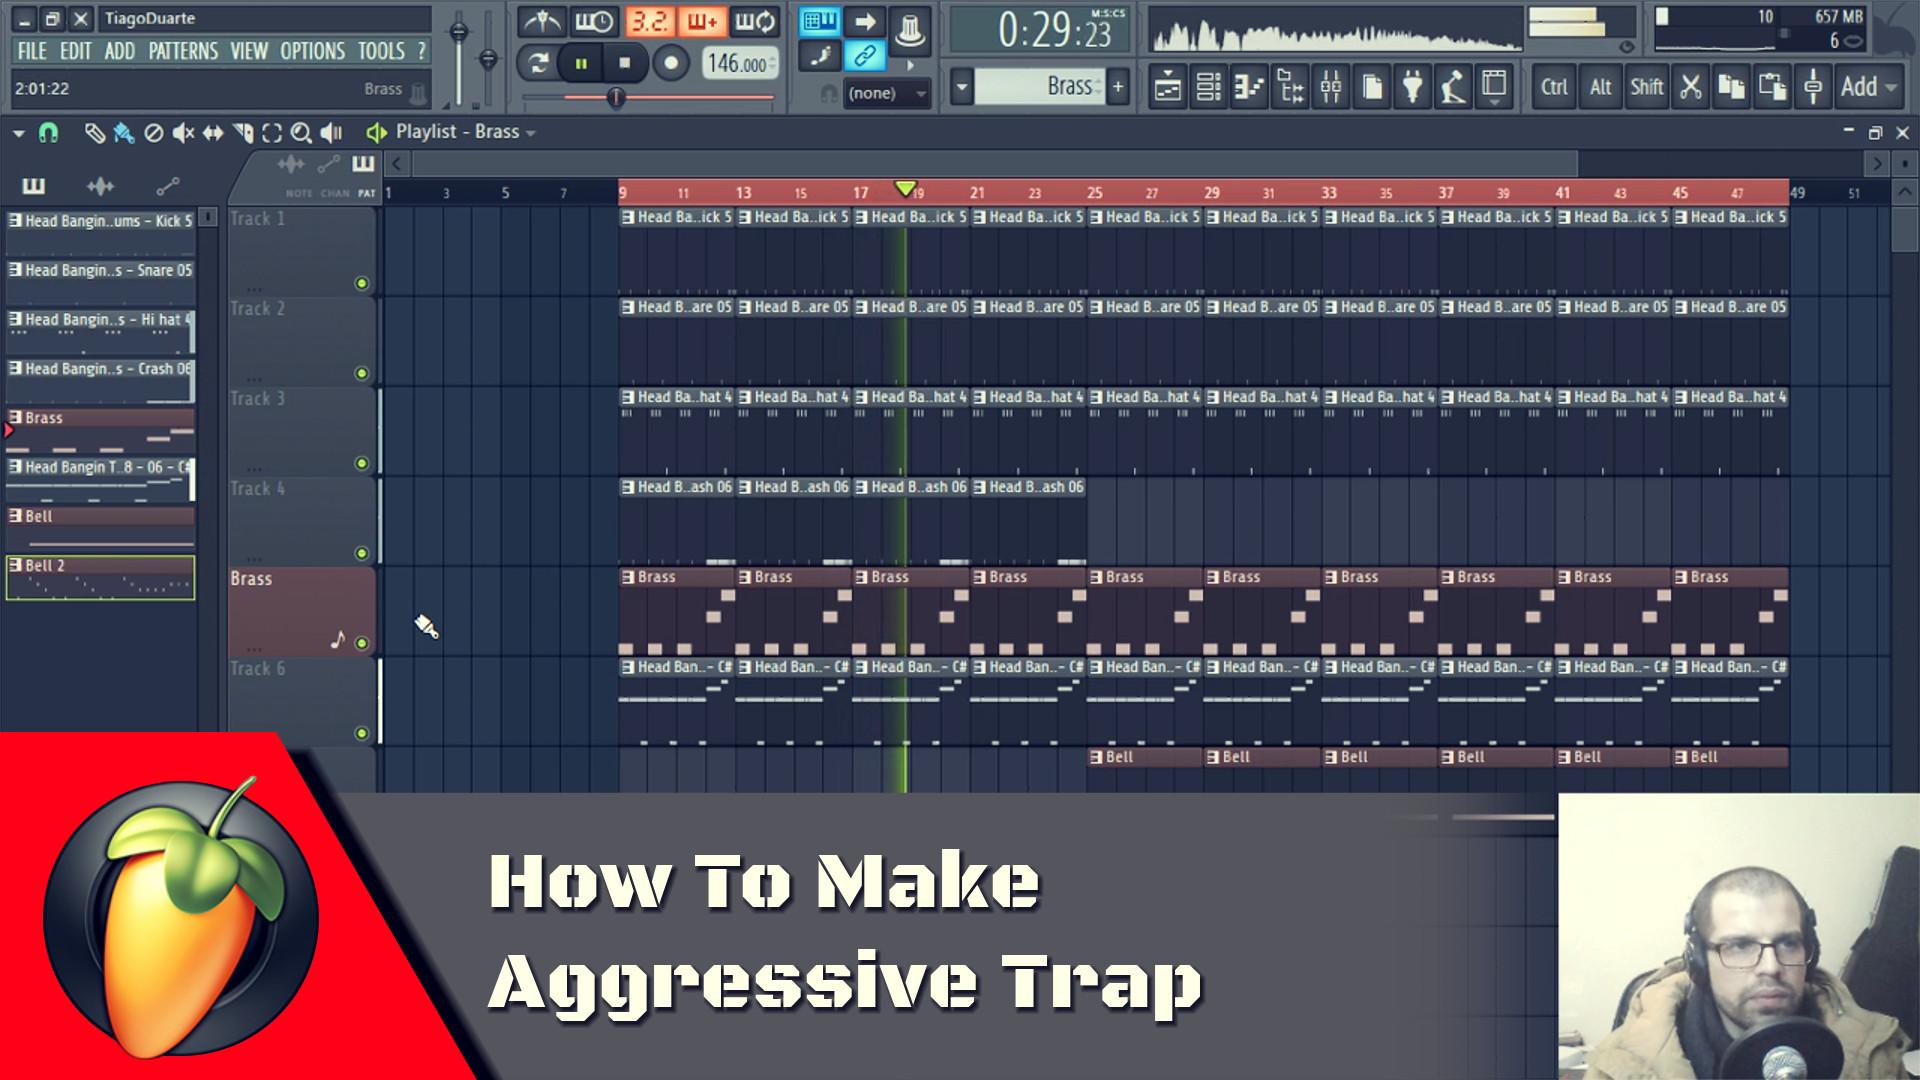 How To Make Aggressive Trap